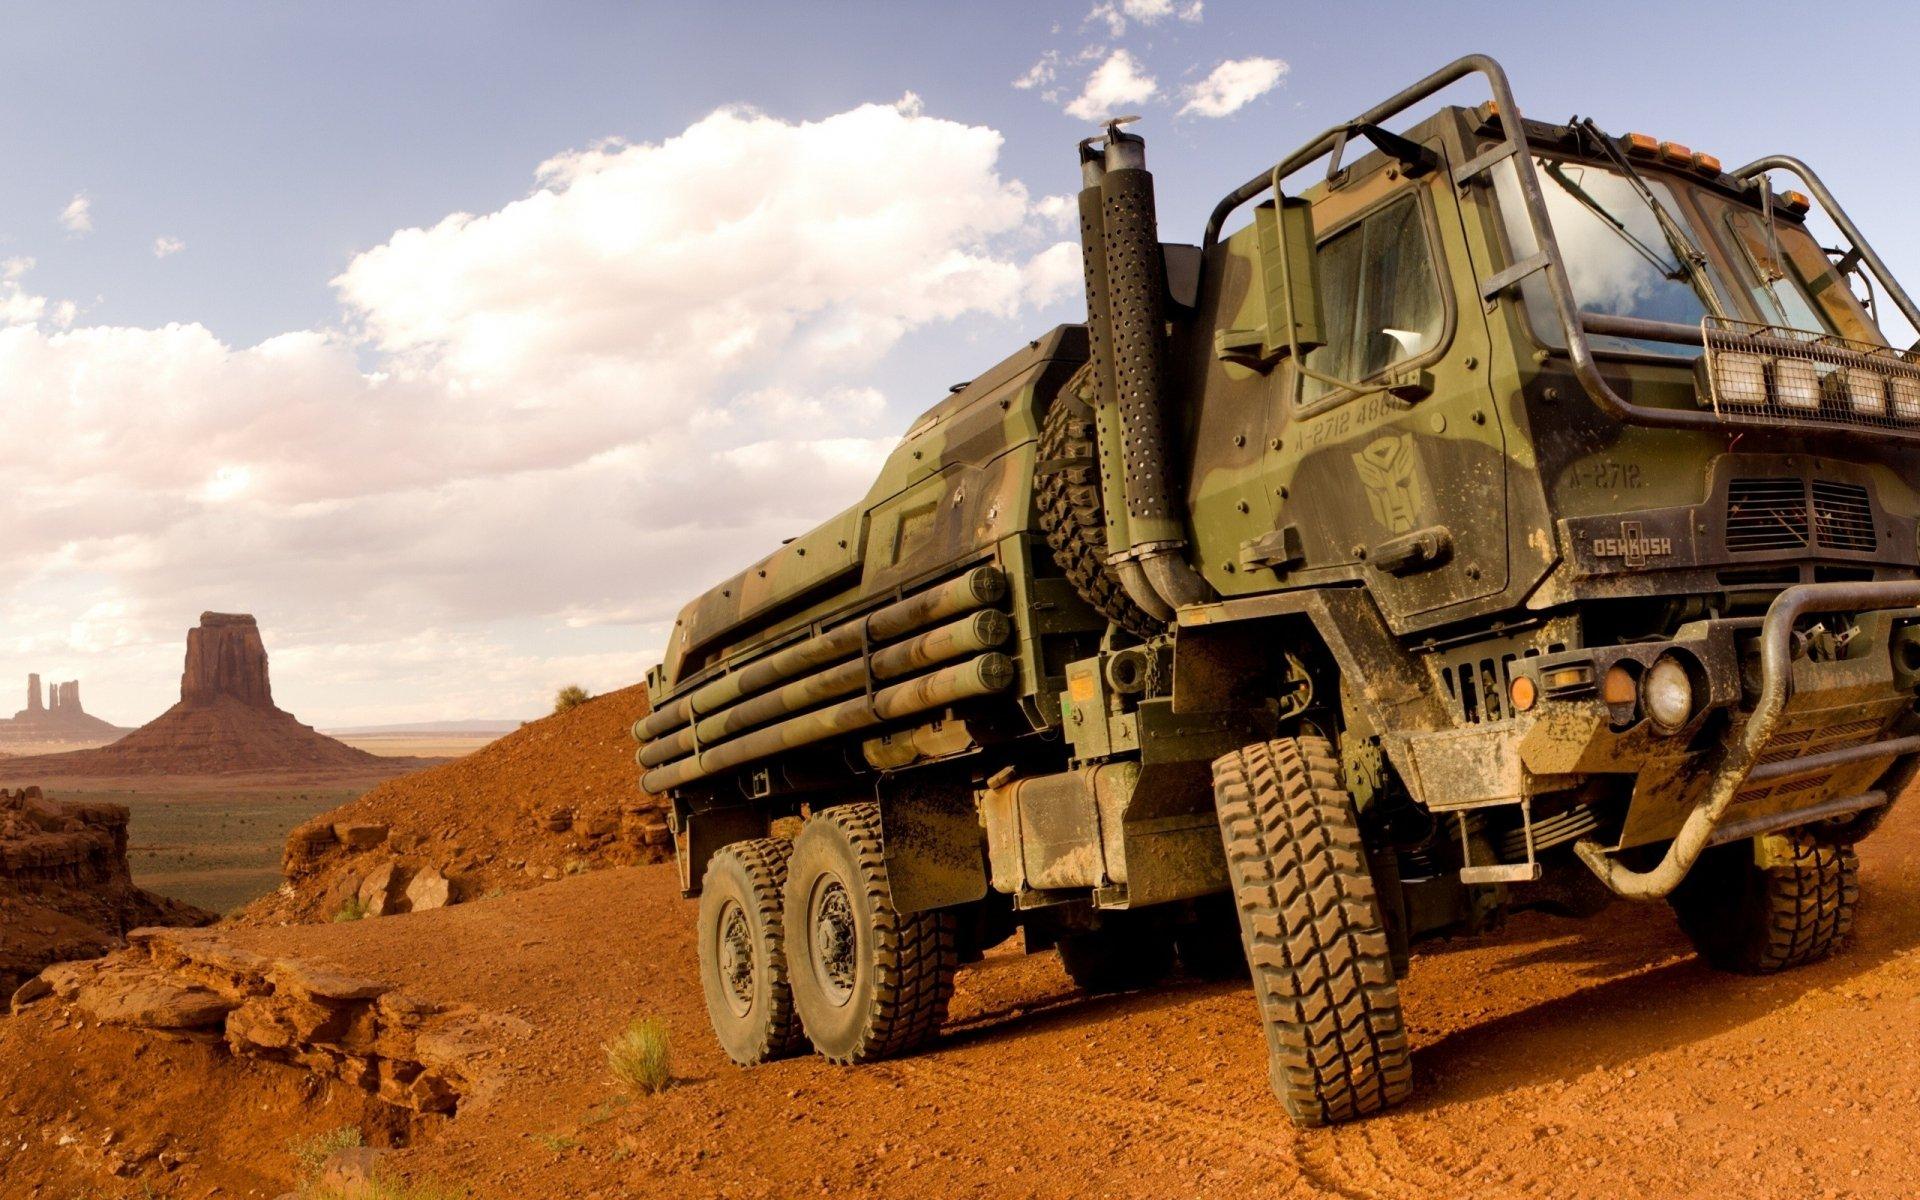 Wallpaper camion militar